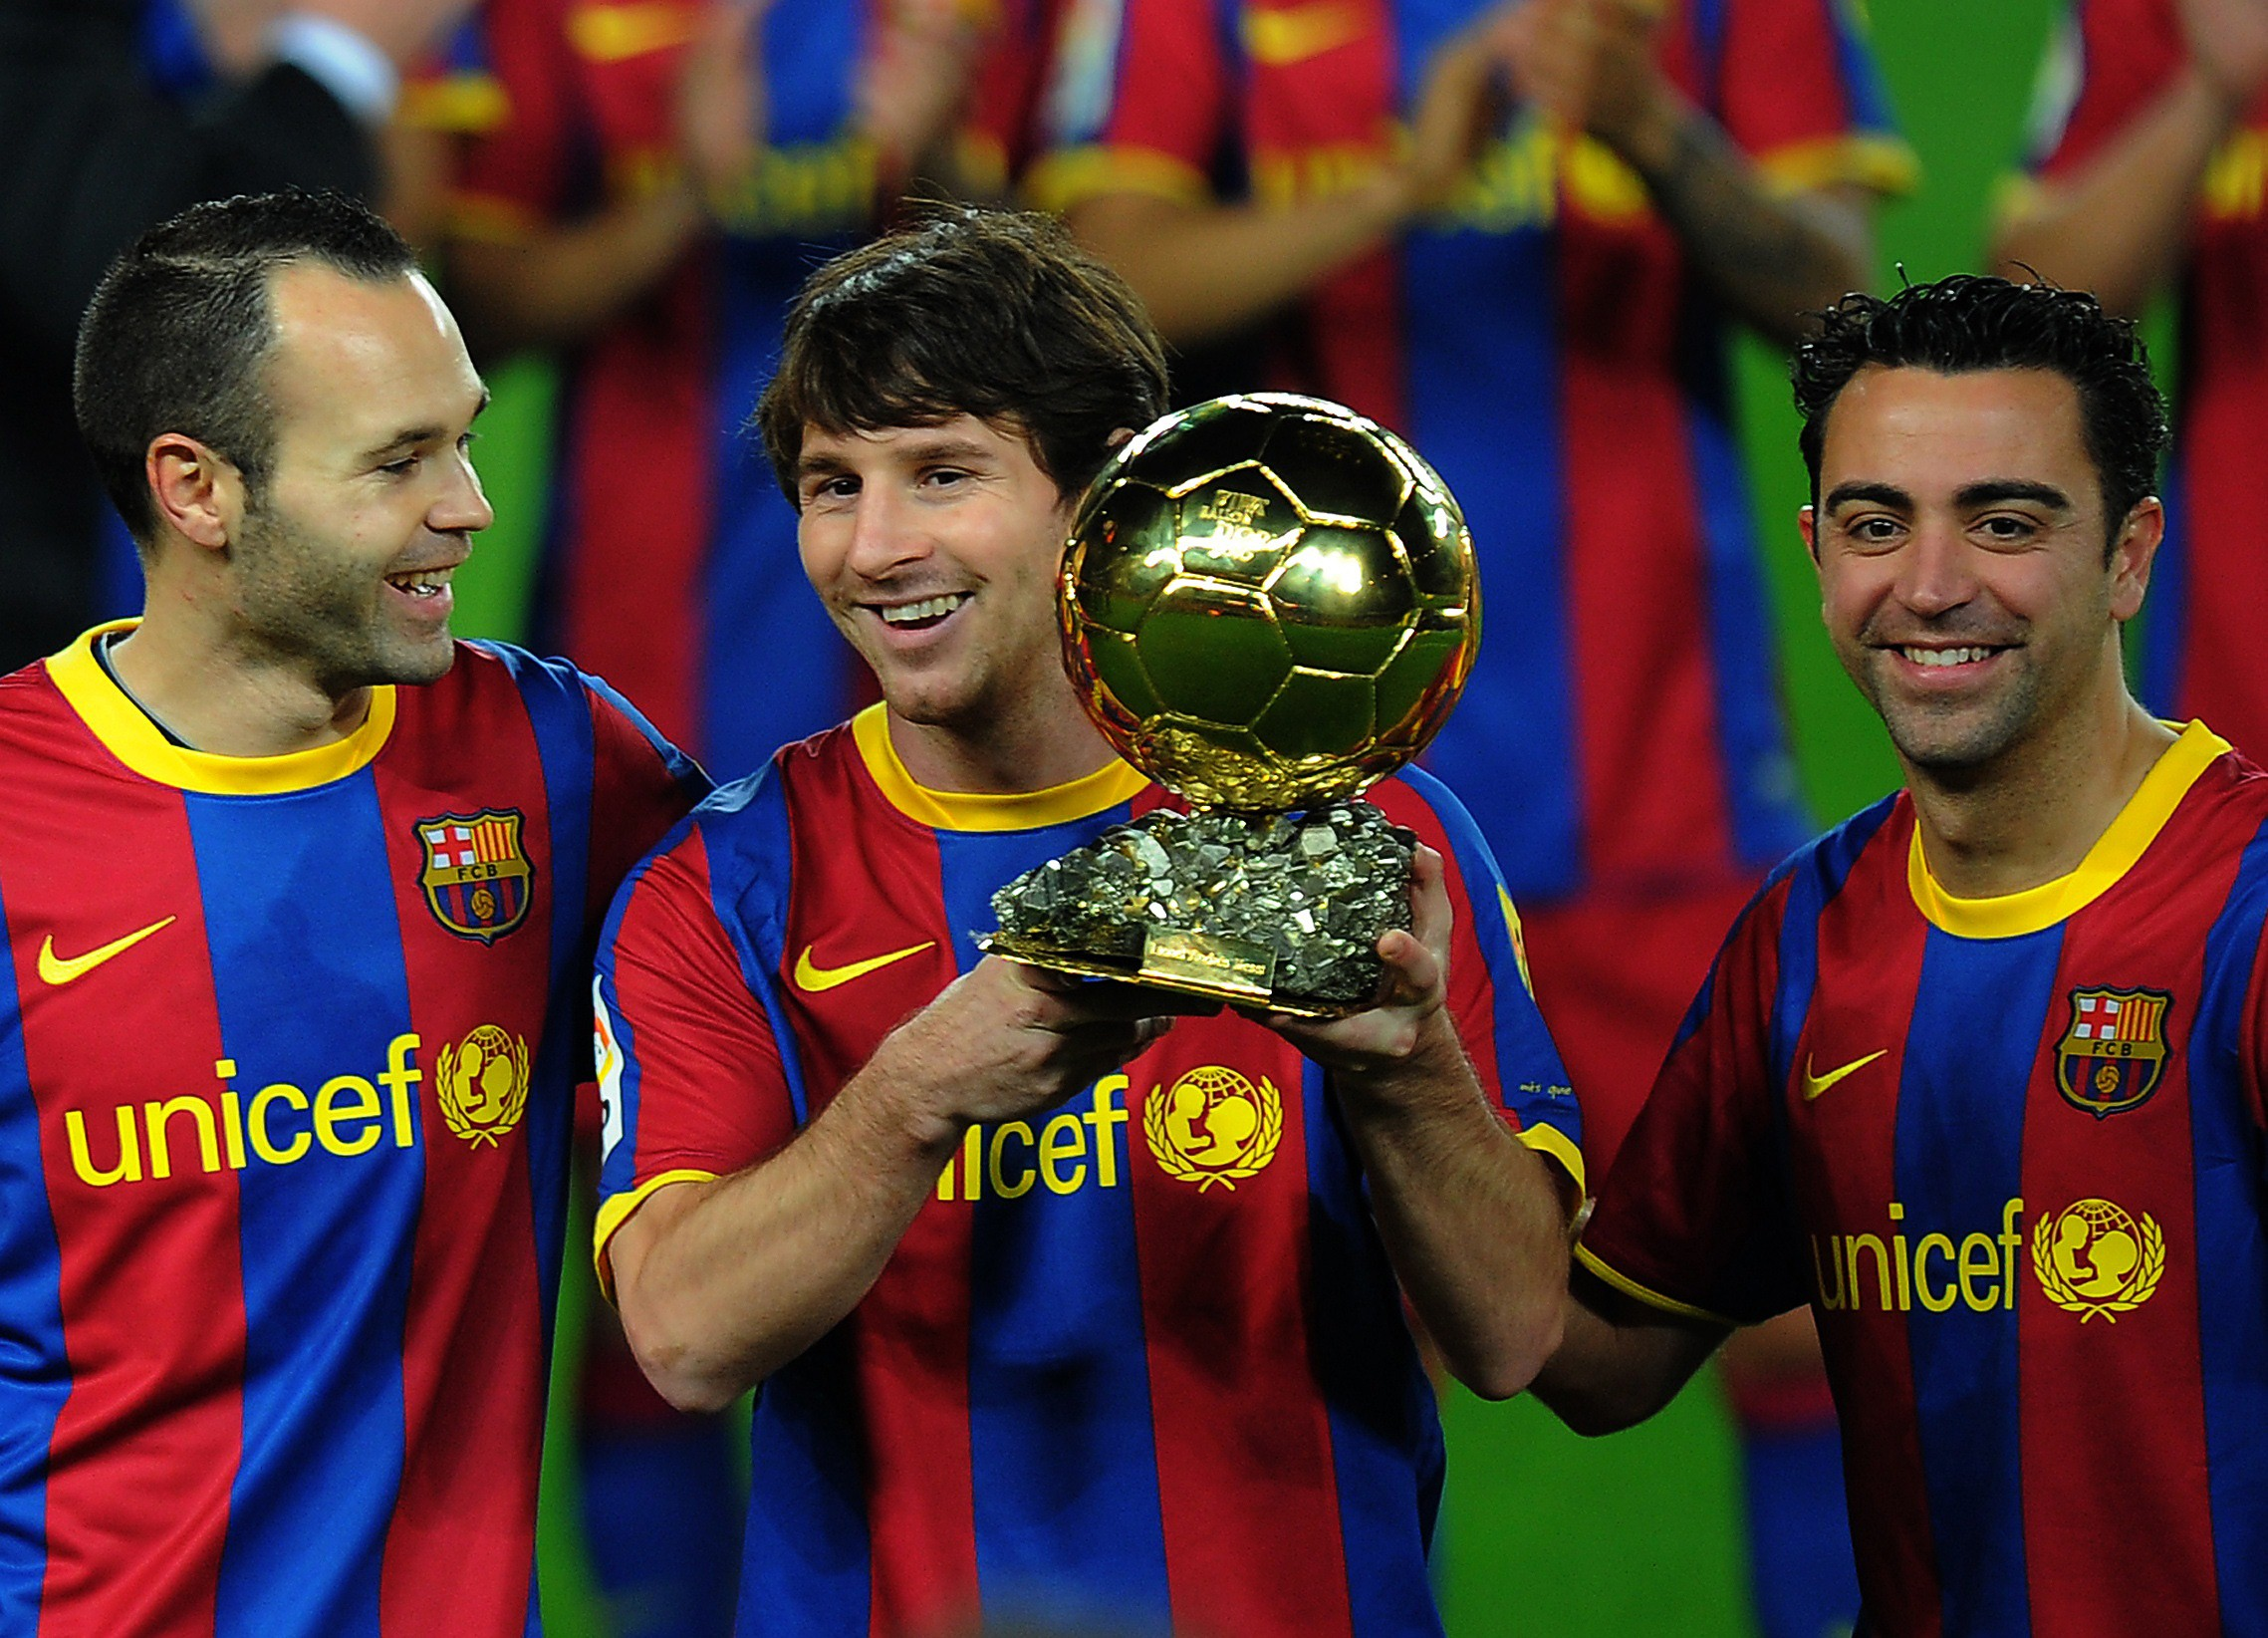 Iniesta et Xavi accompagnent Messi et son Ballon d'Or en 2011